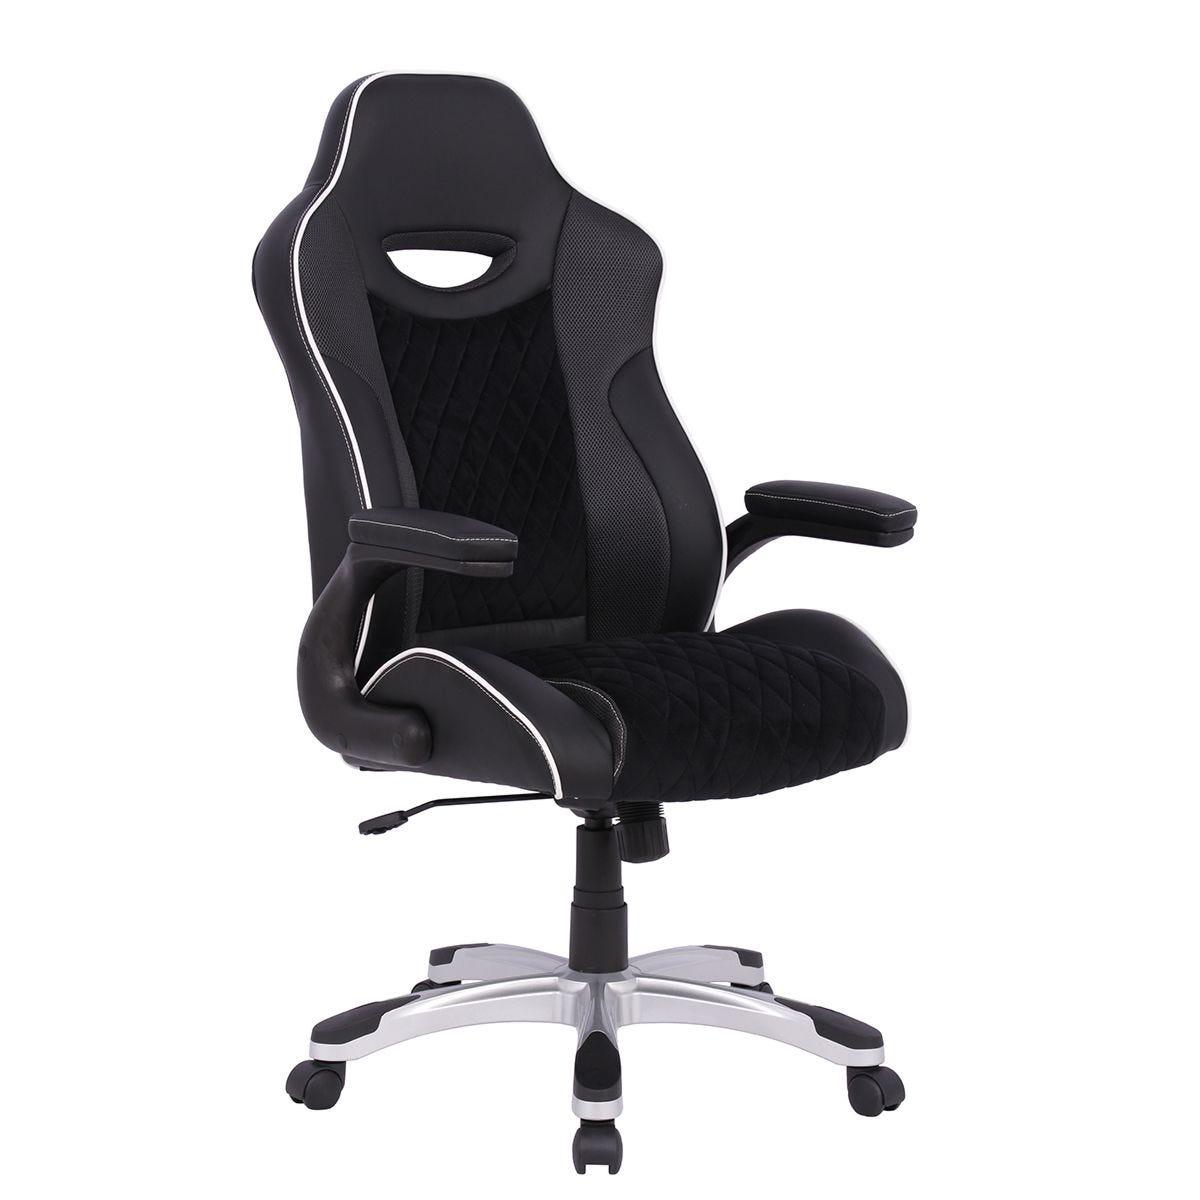 Alphason Silverstone Gaming Chair - Black